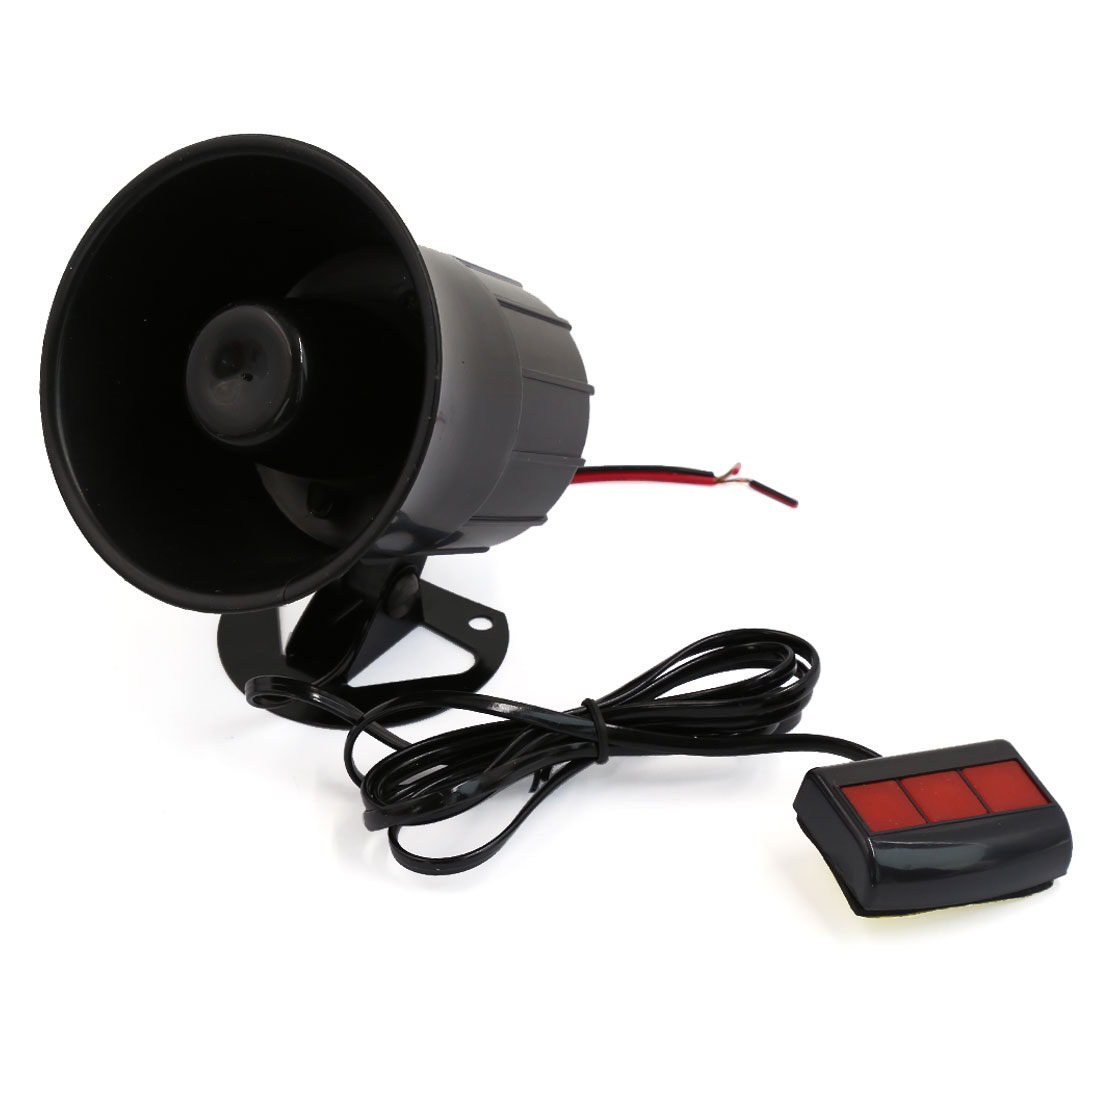 3 Sounds Tone Motorcycle Car Van Vehicle Loud Siren Security Horn DC 12V